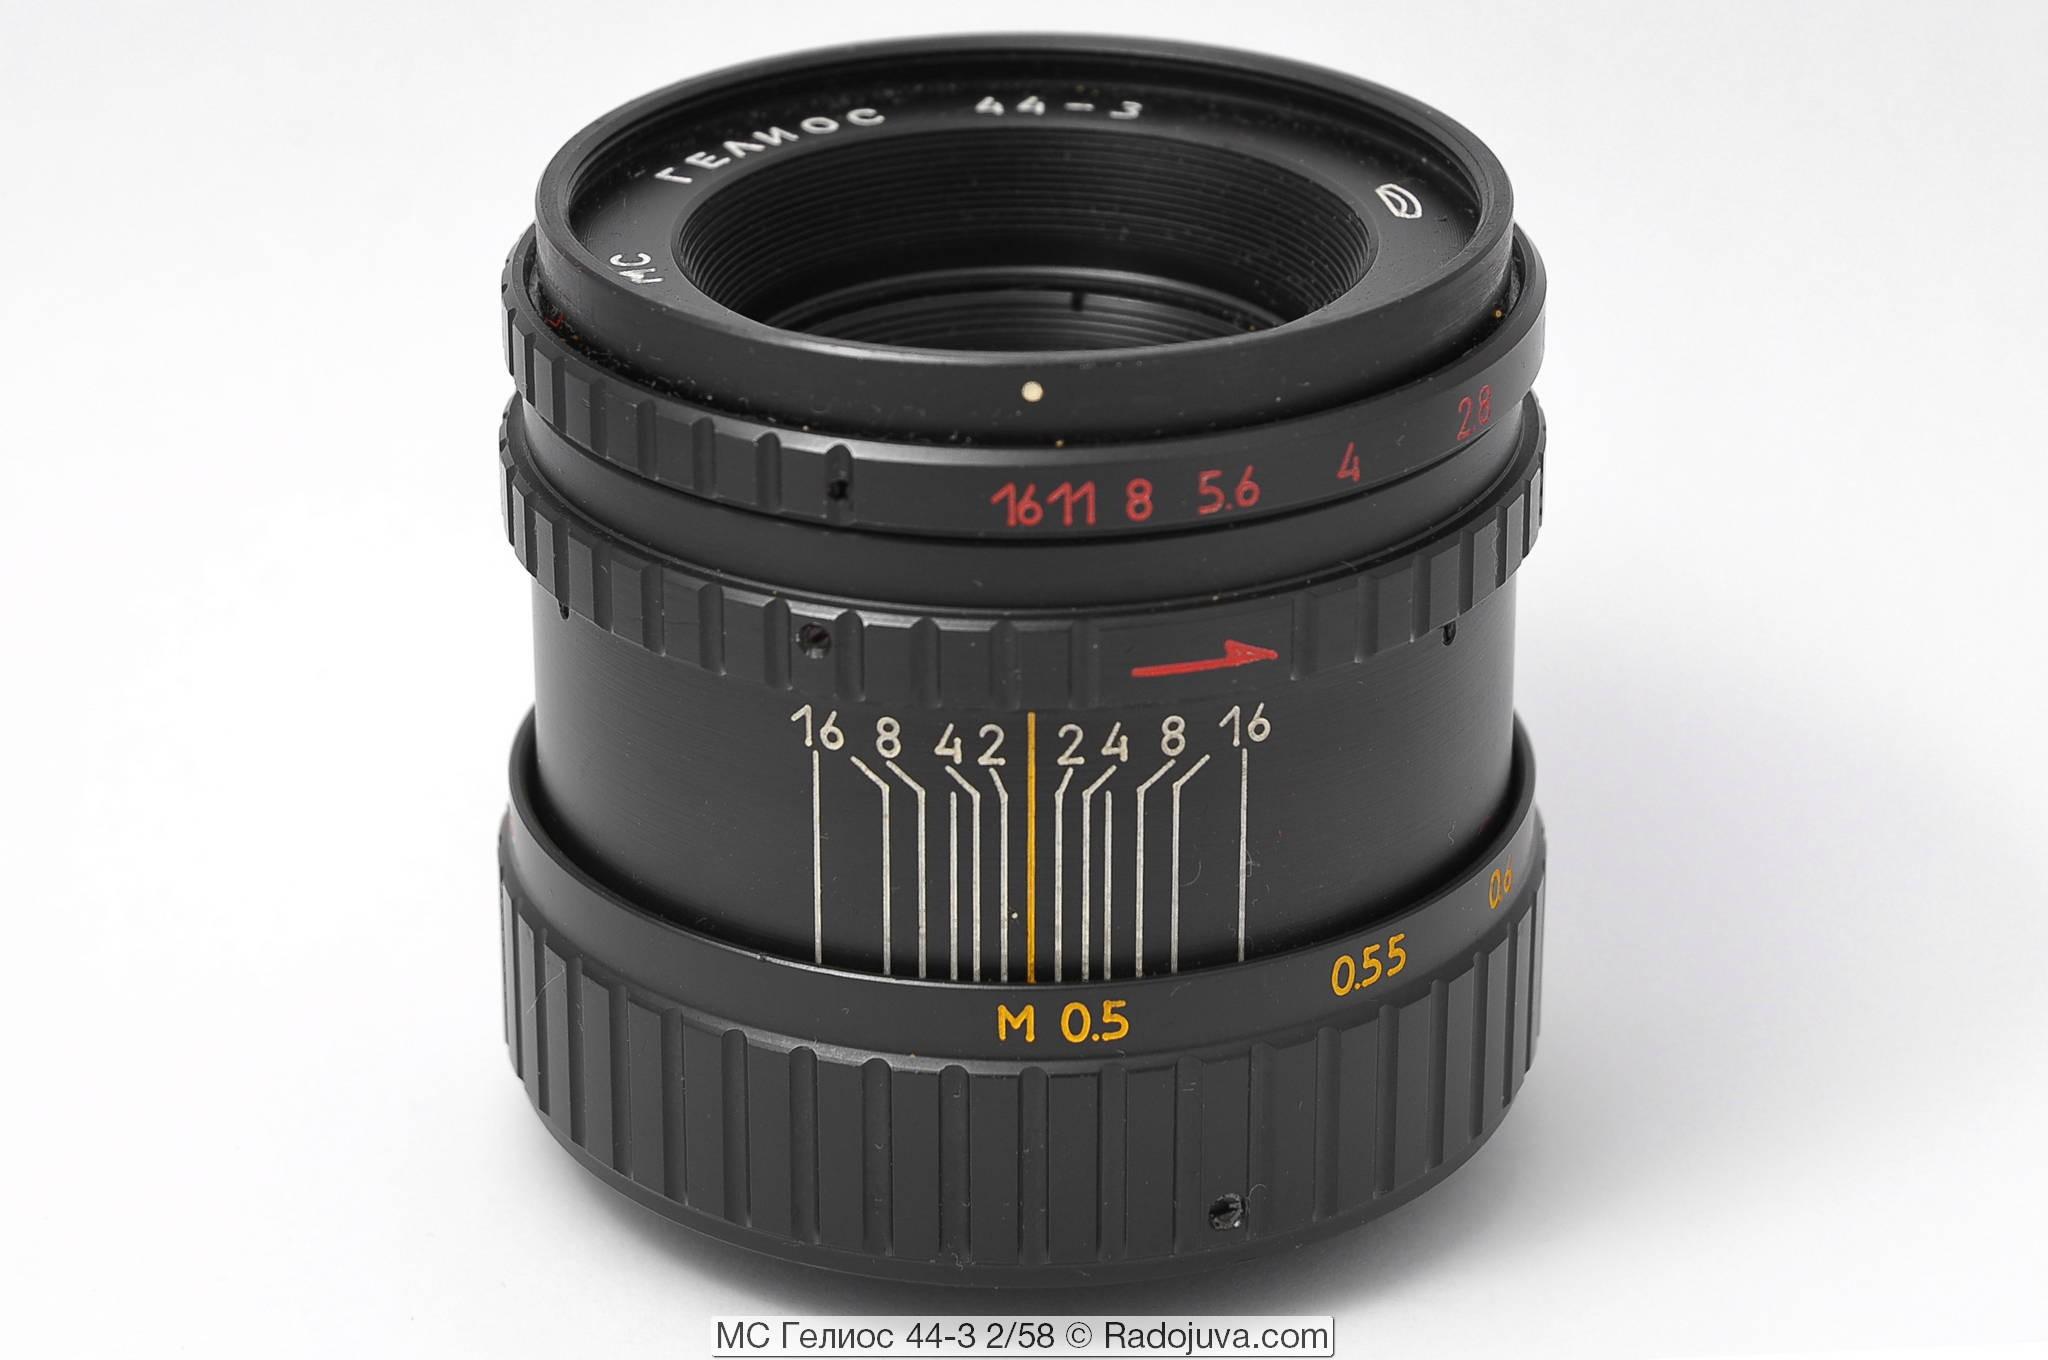 苏联镜头: Helios 44-3 2/58 MS MMZ, 8 光圈版